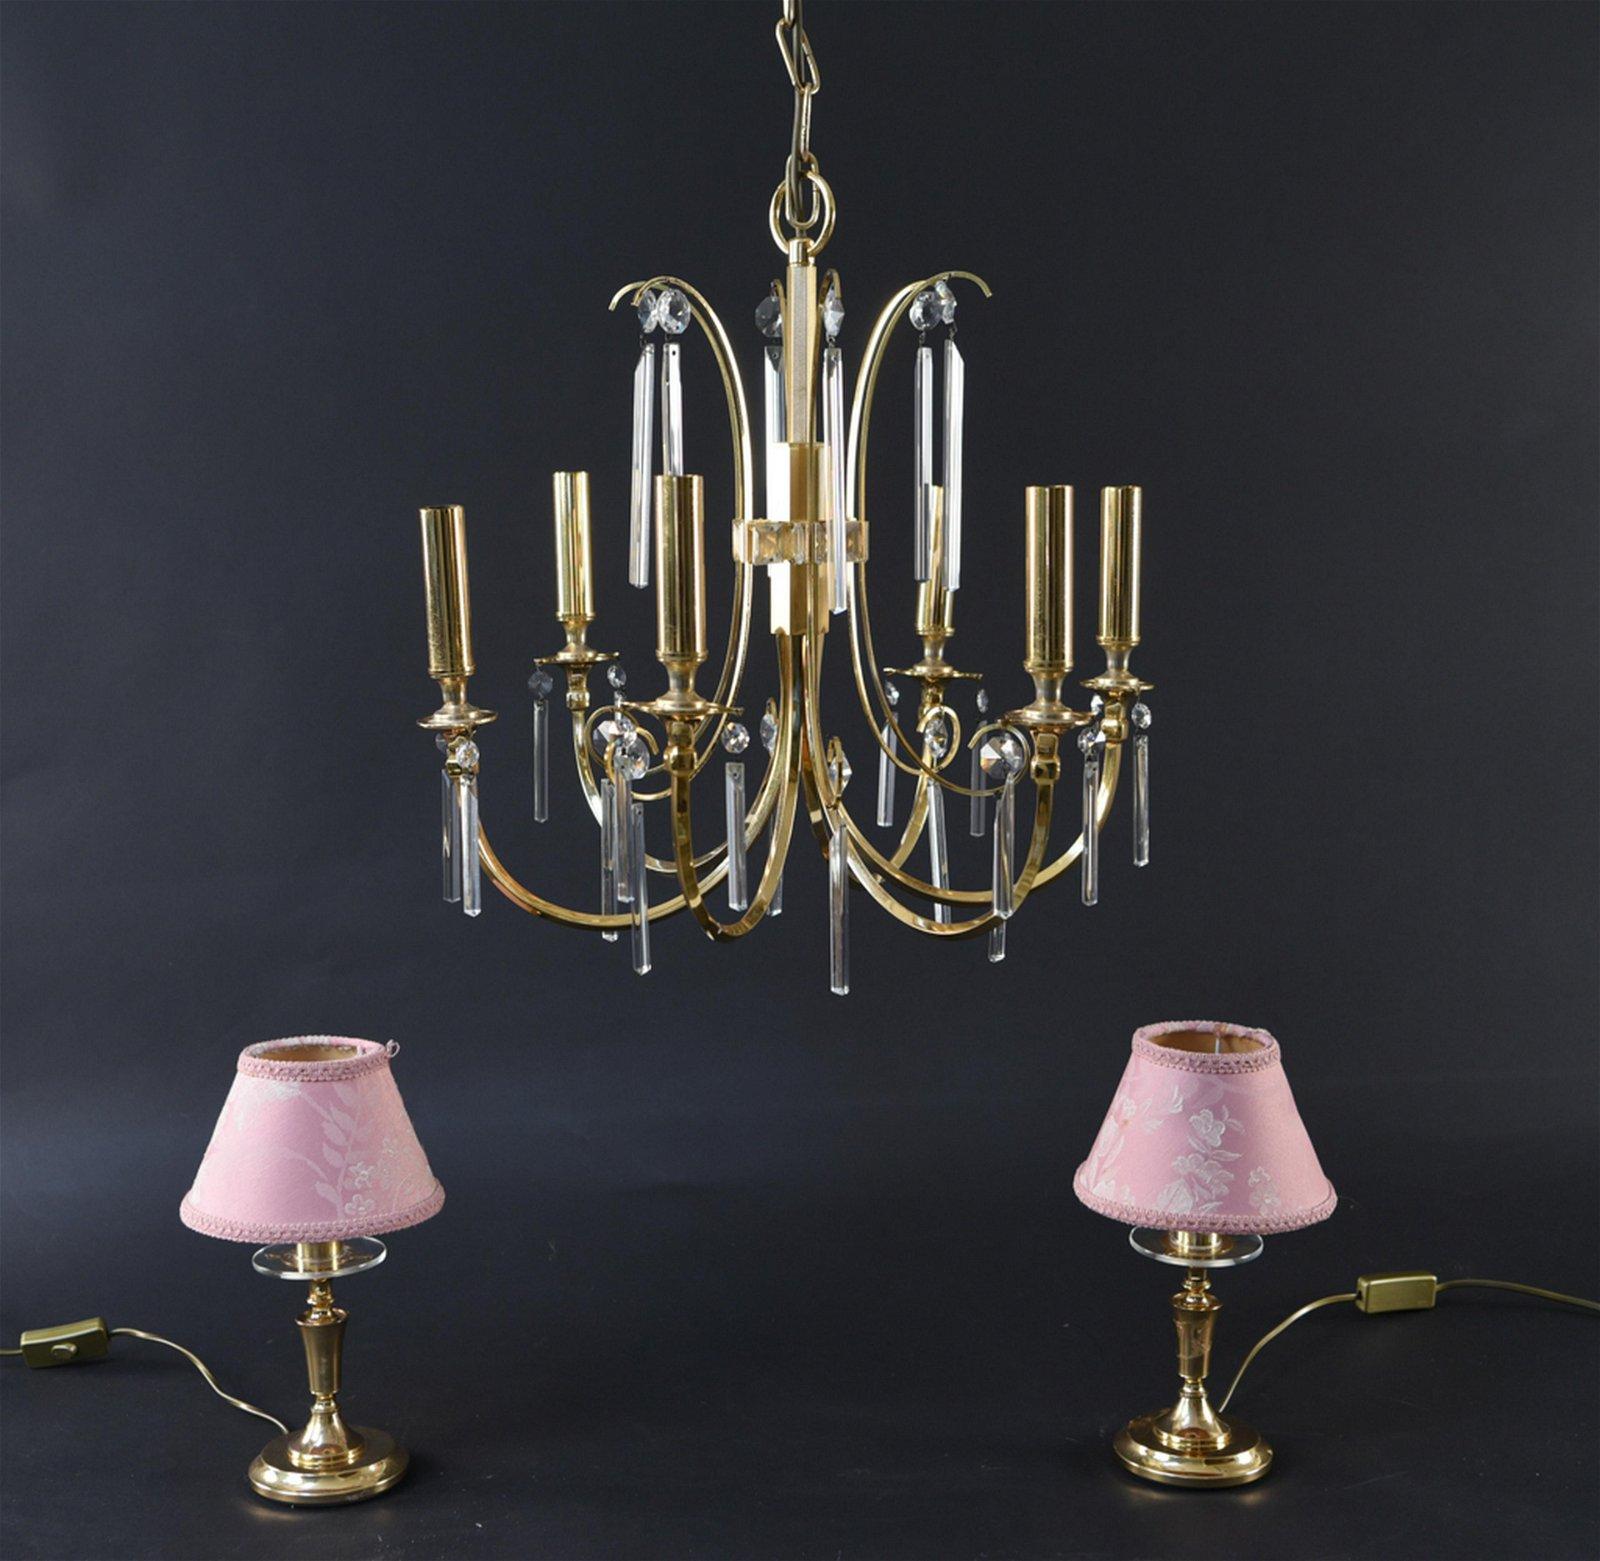 SCIOLARI CHANDELIER & PAIR OF TABLE LAMPS